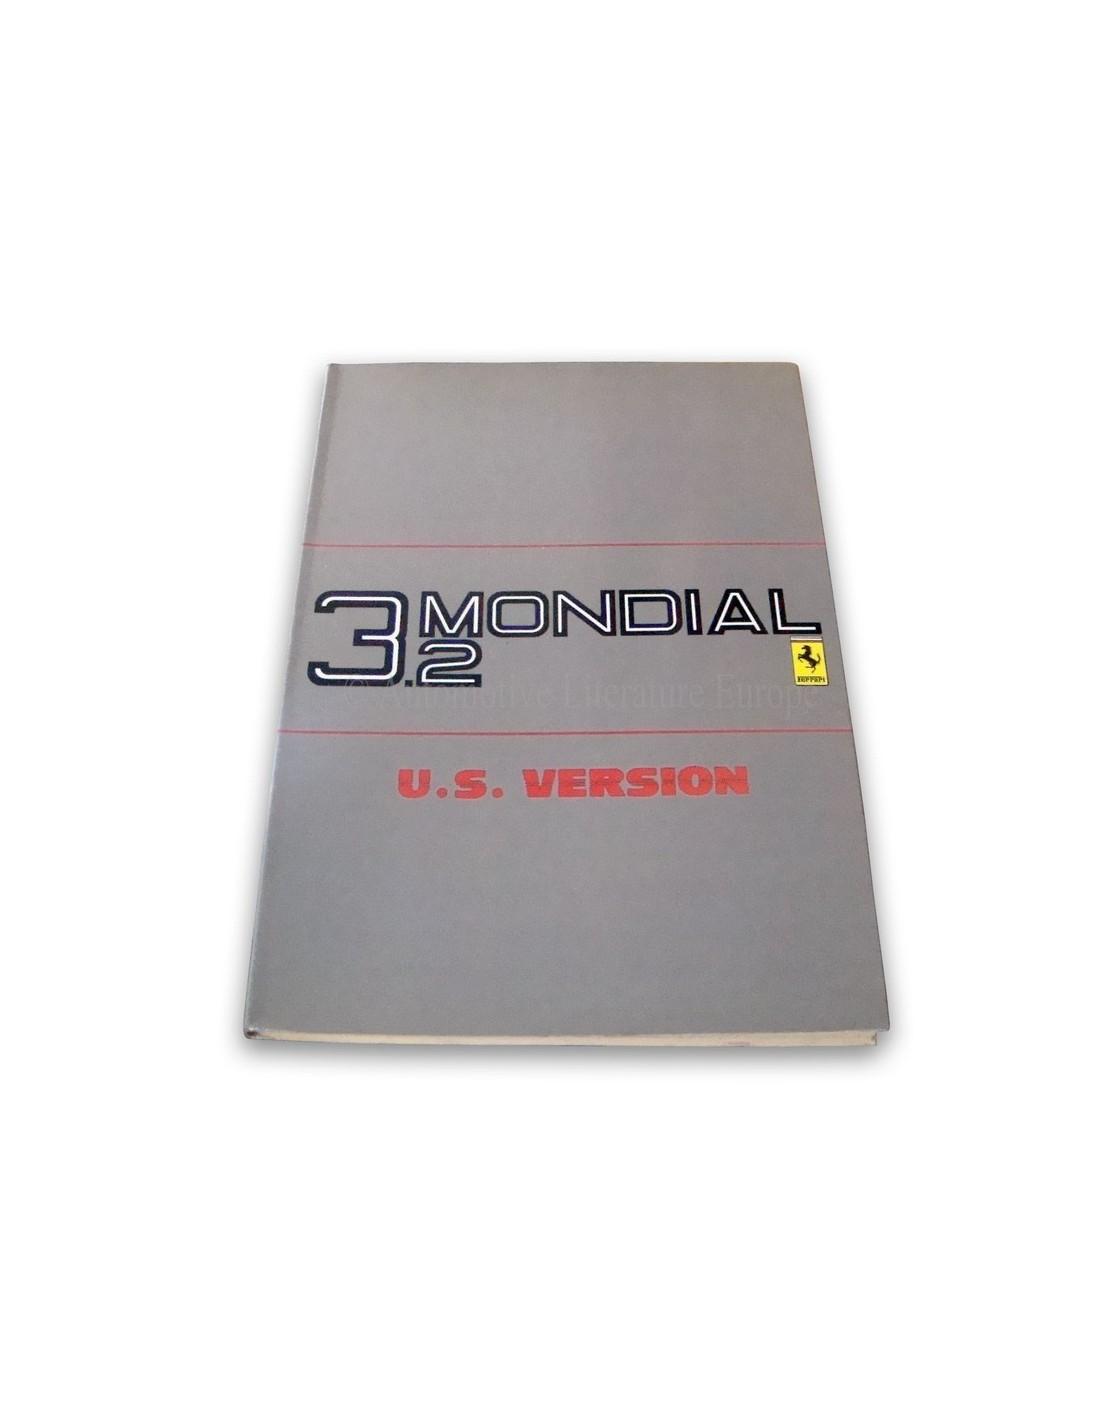 1986 ferrari 3 2 mondial owner 39 s manual u s version 397 85. Black Bedroom Furniture Sets. Home Design Ideas